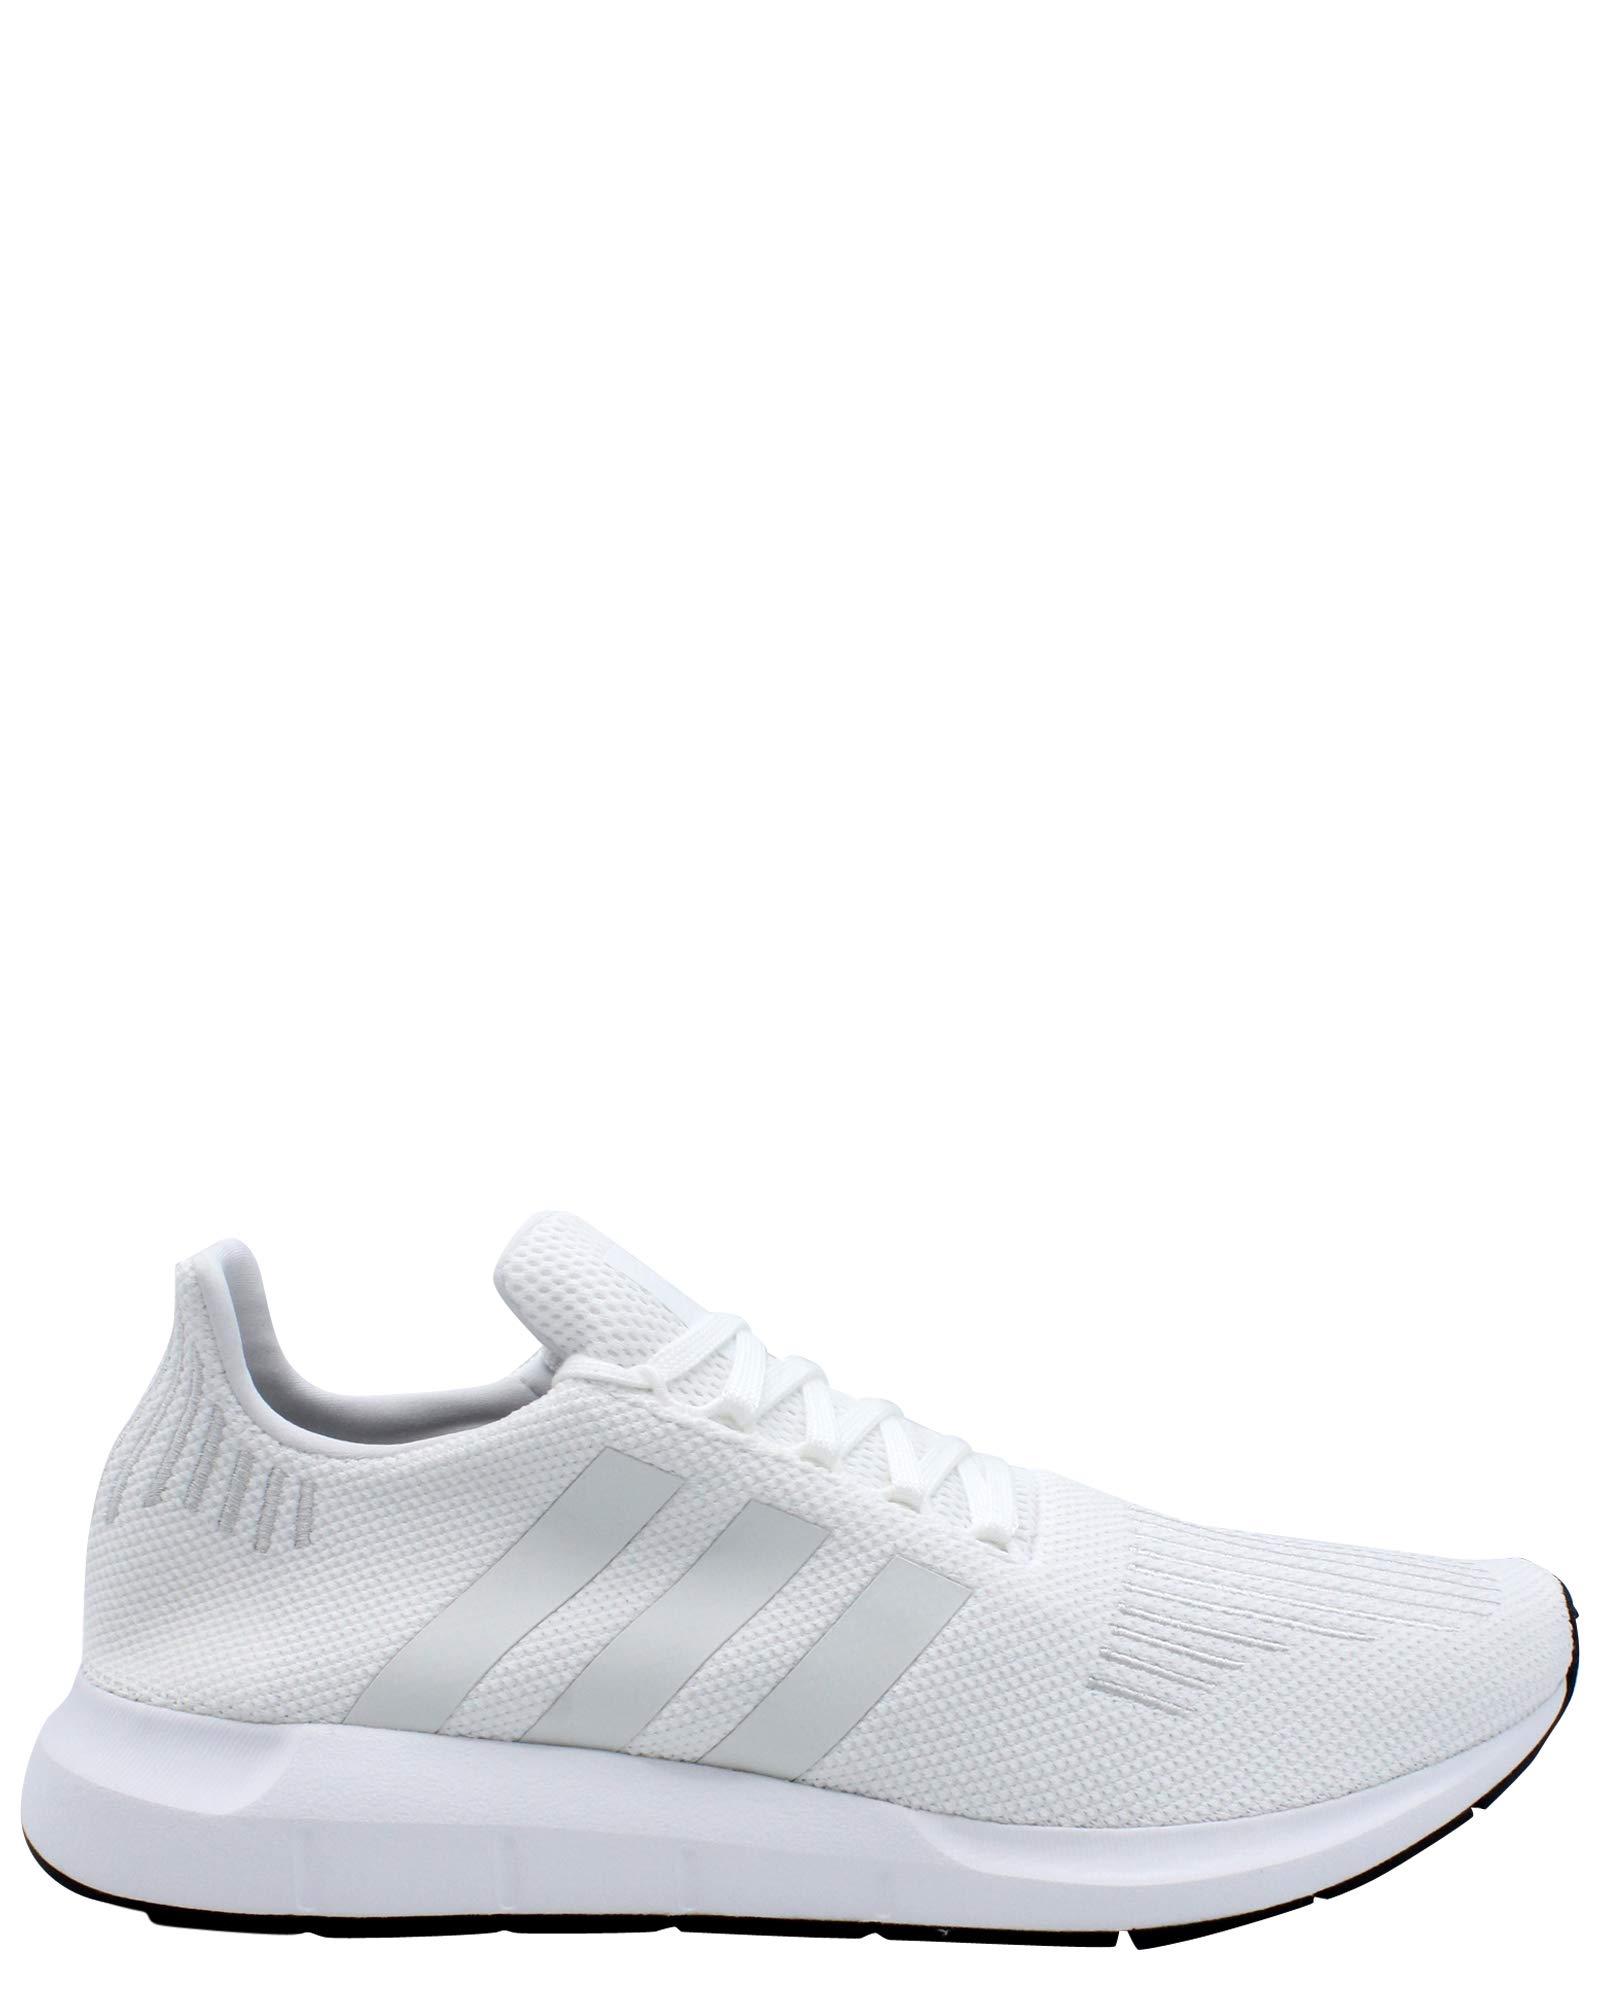 c382adde202b0 Galleon - Adidas Originals Men s SWIFT RUN Shoes